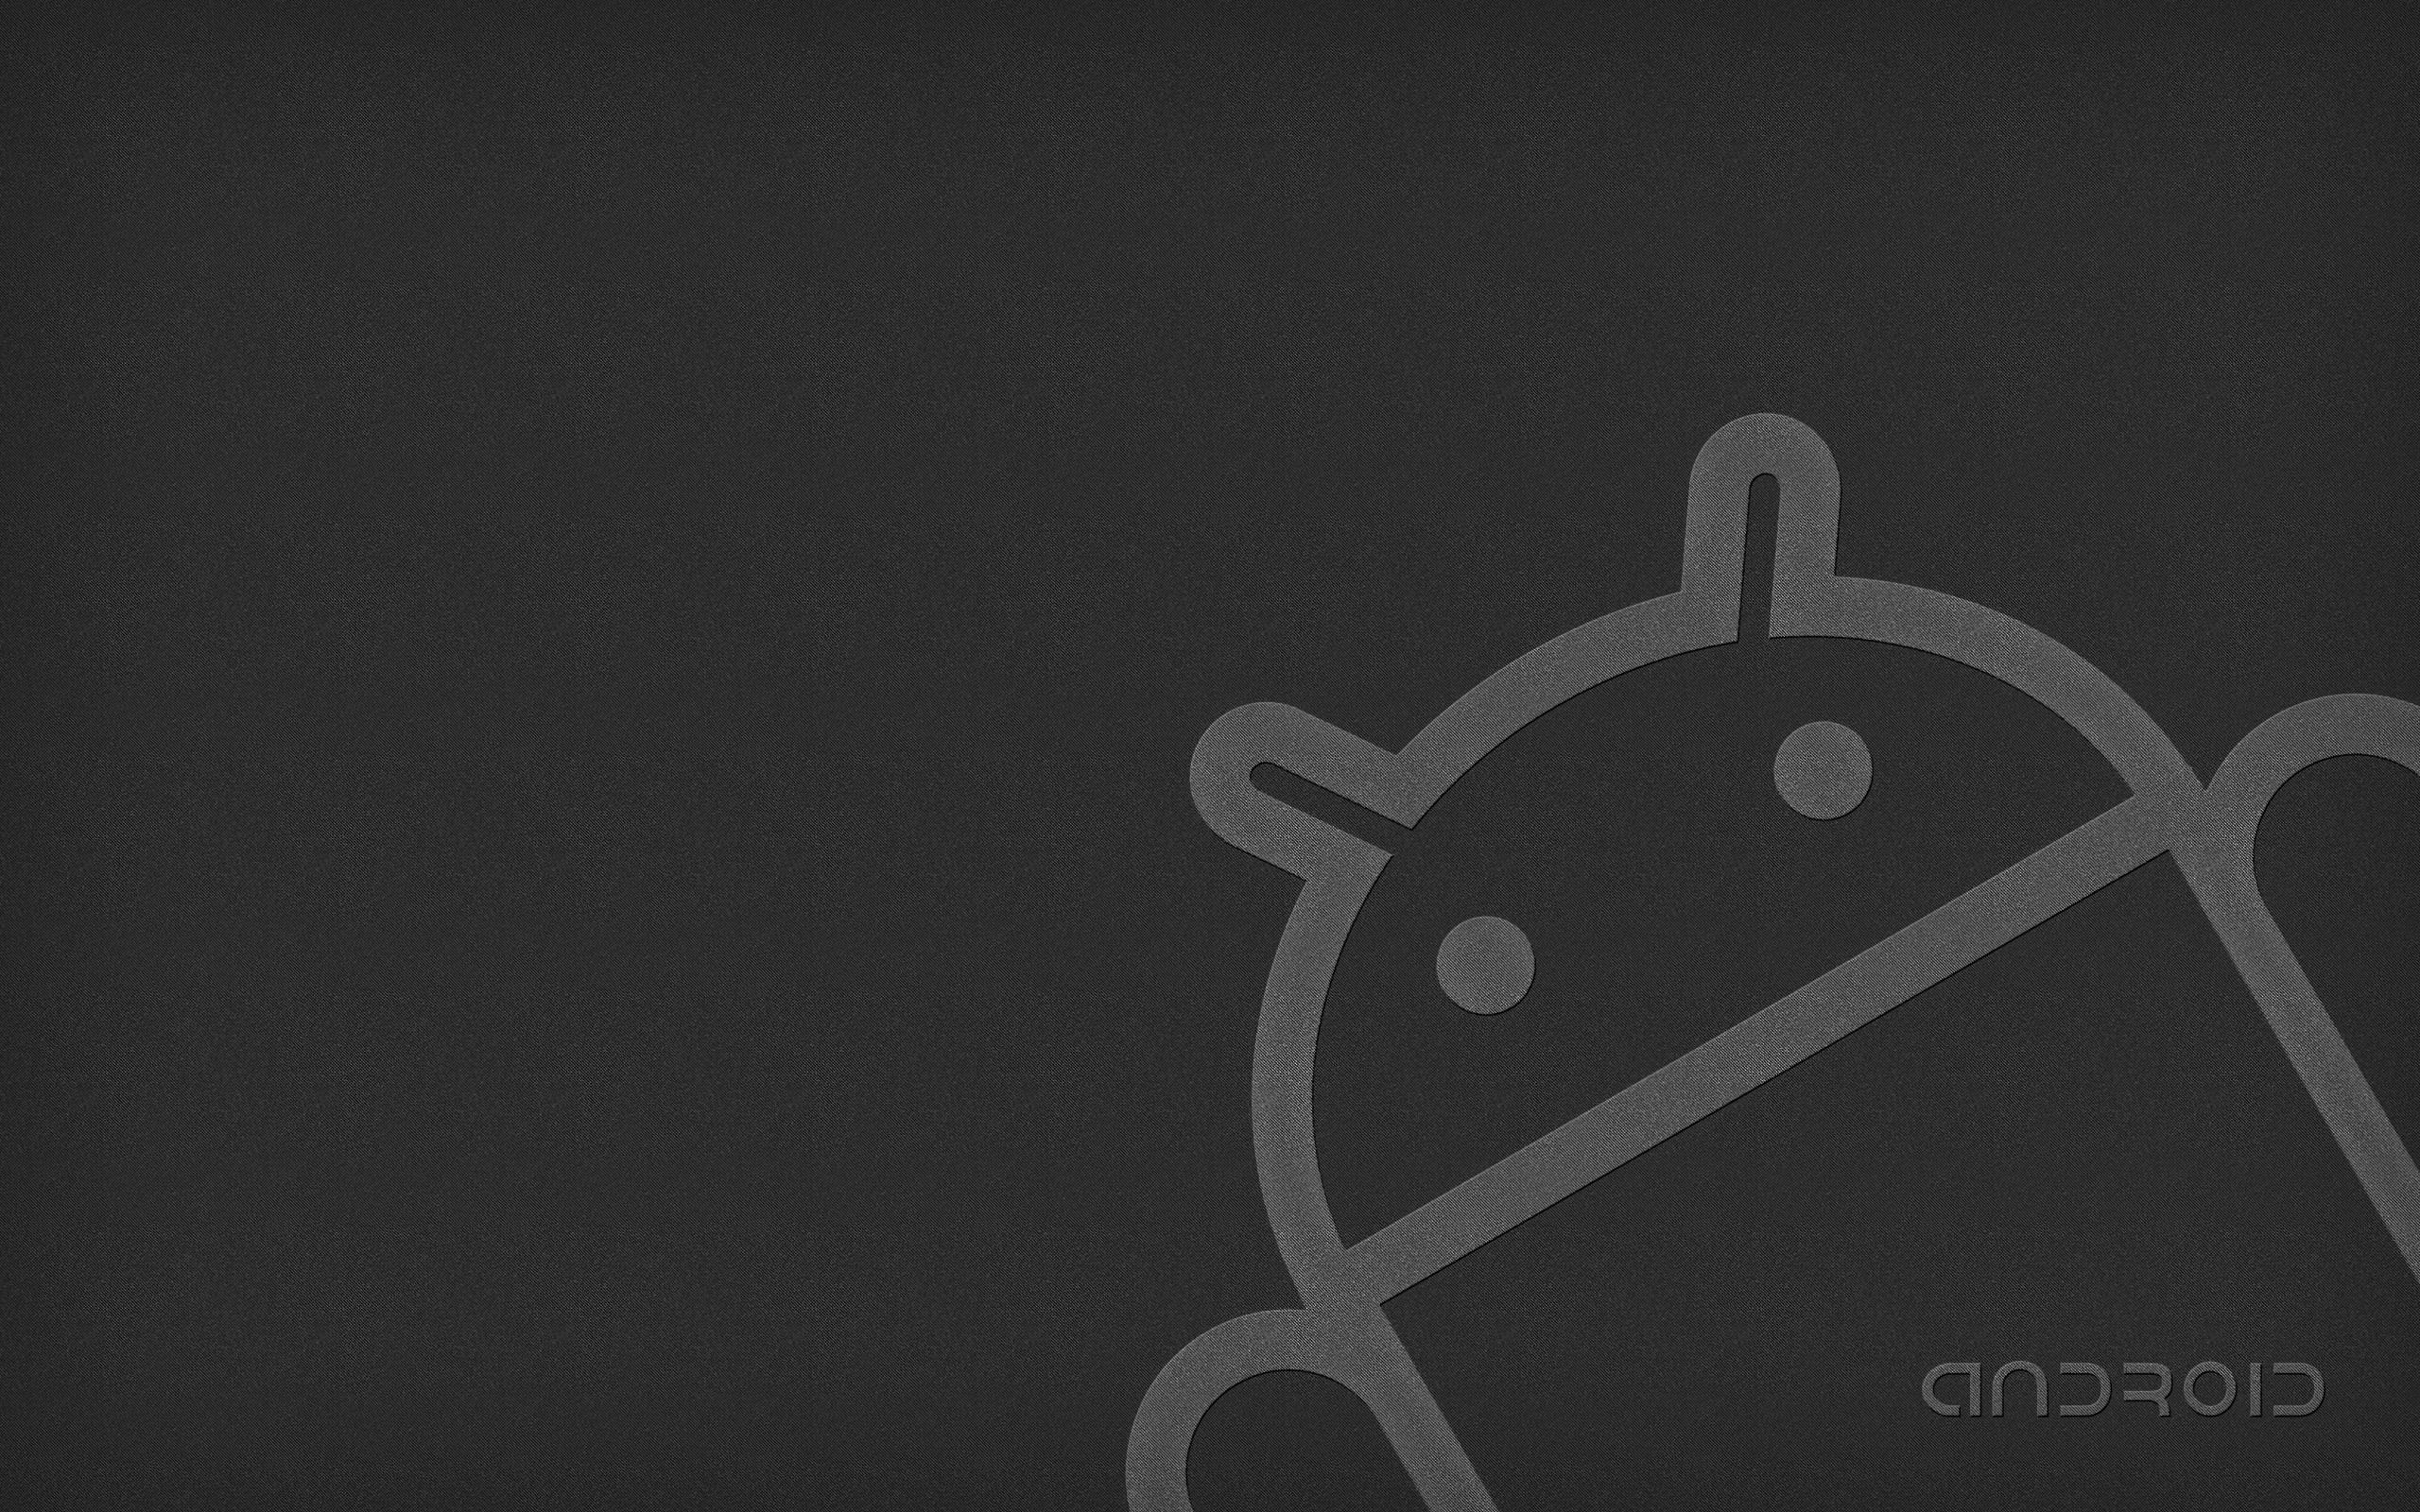 android logo wallpaper hd 43636